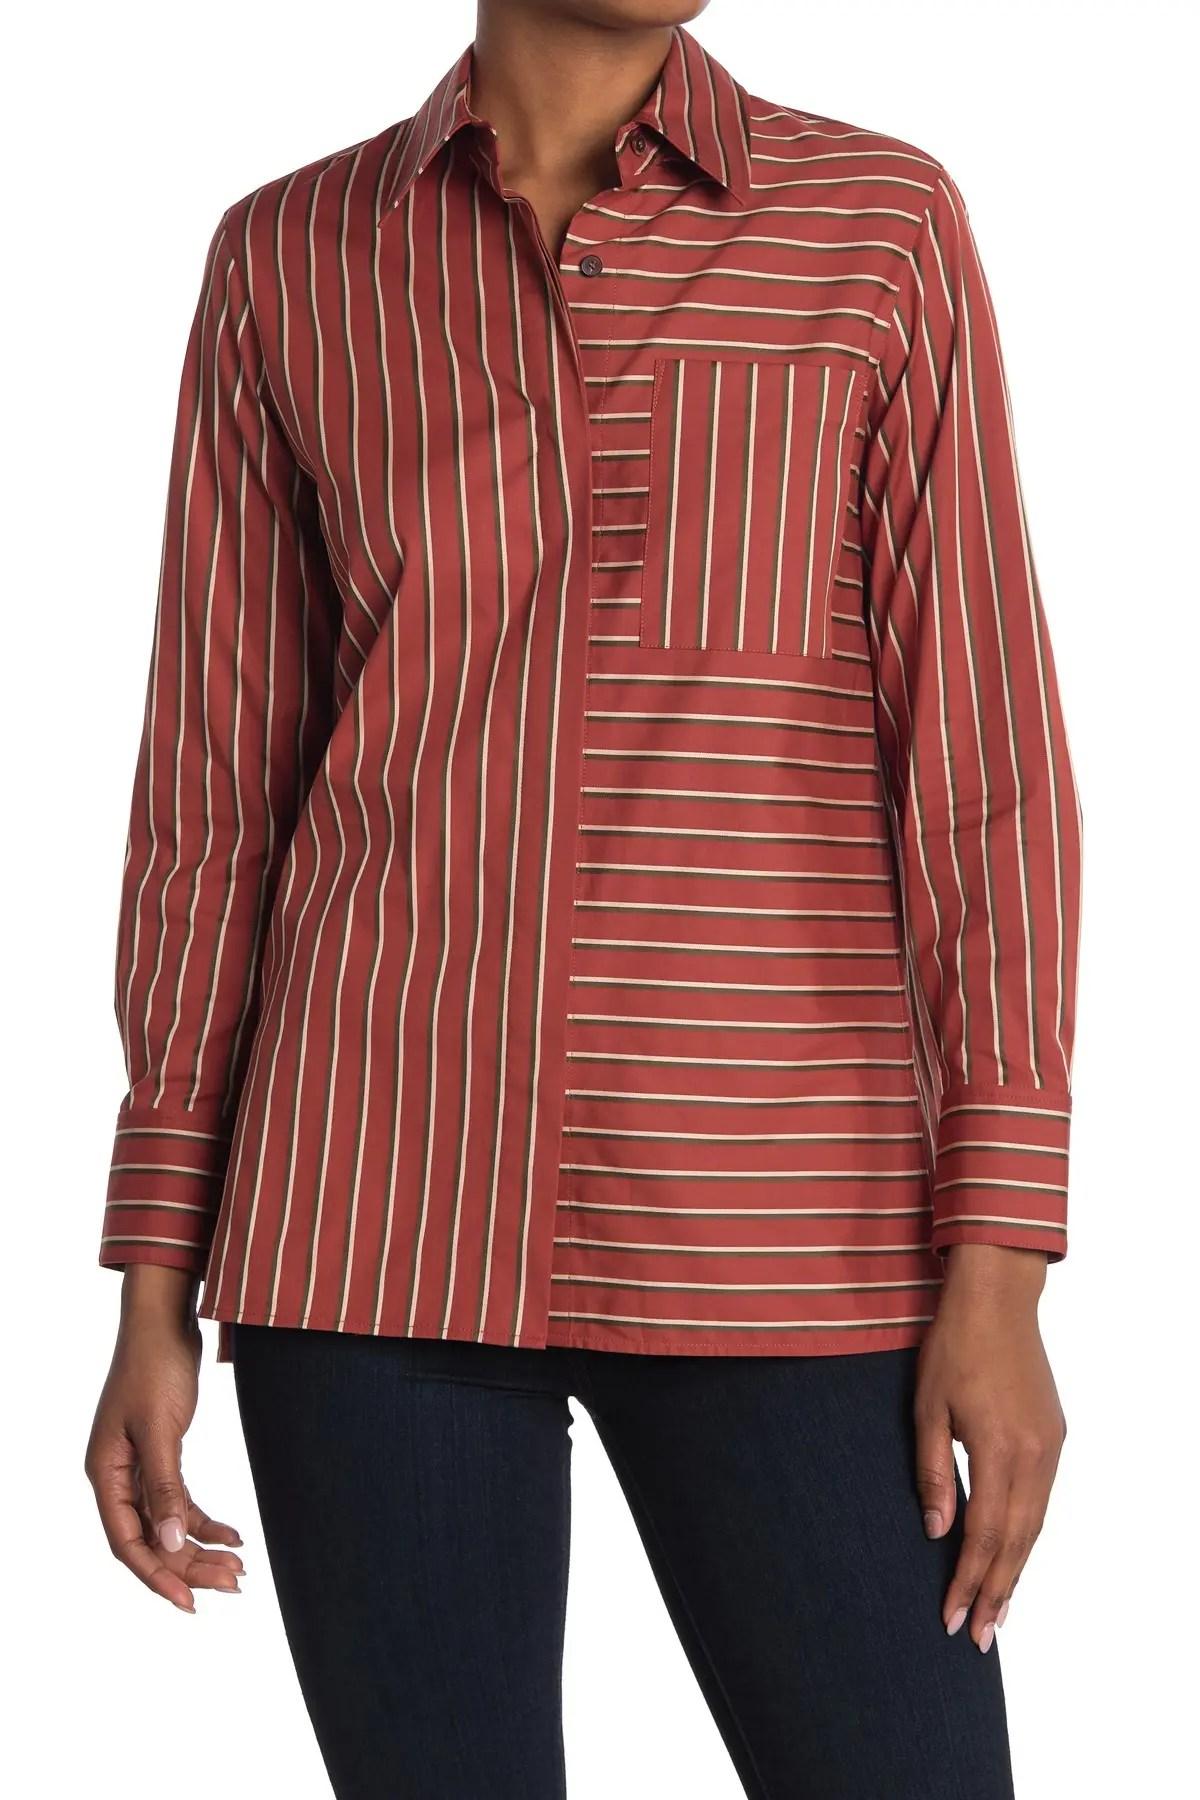 greyson striped tunic blouse